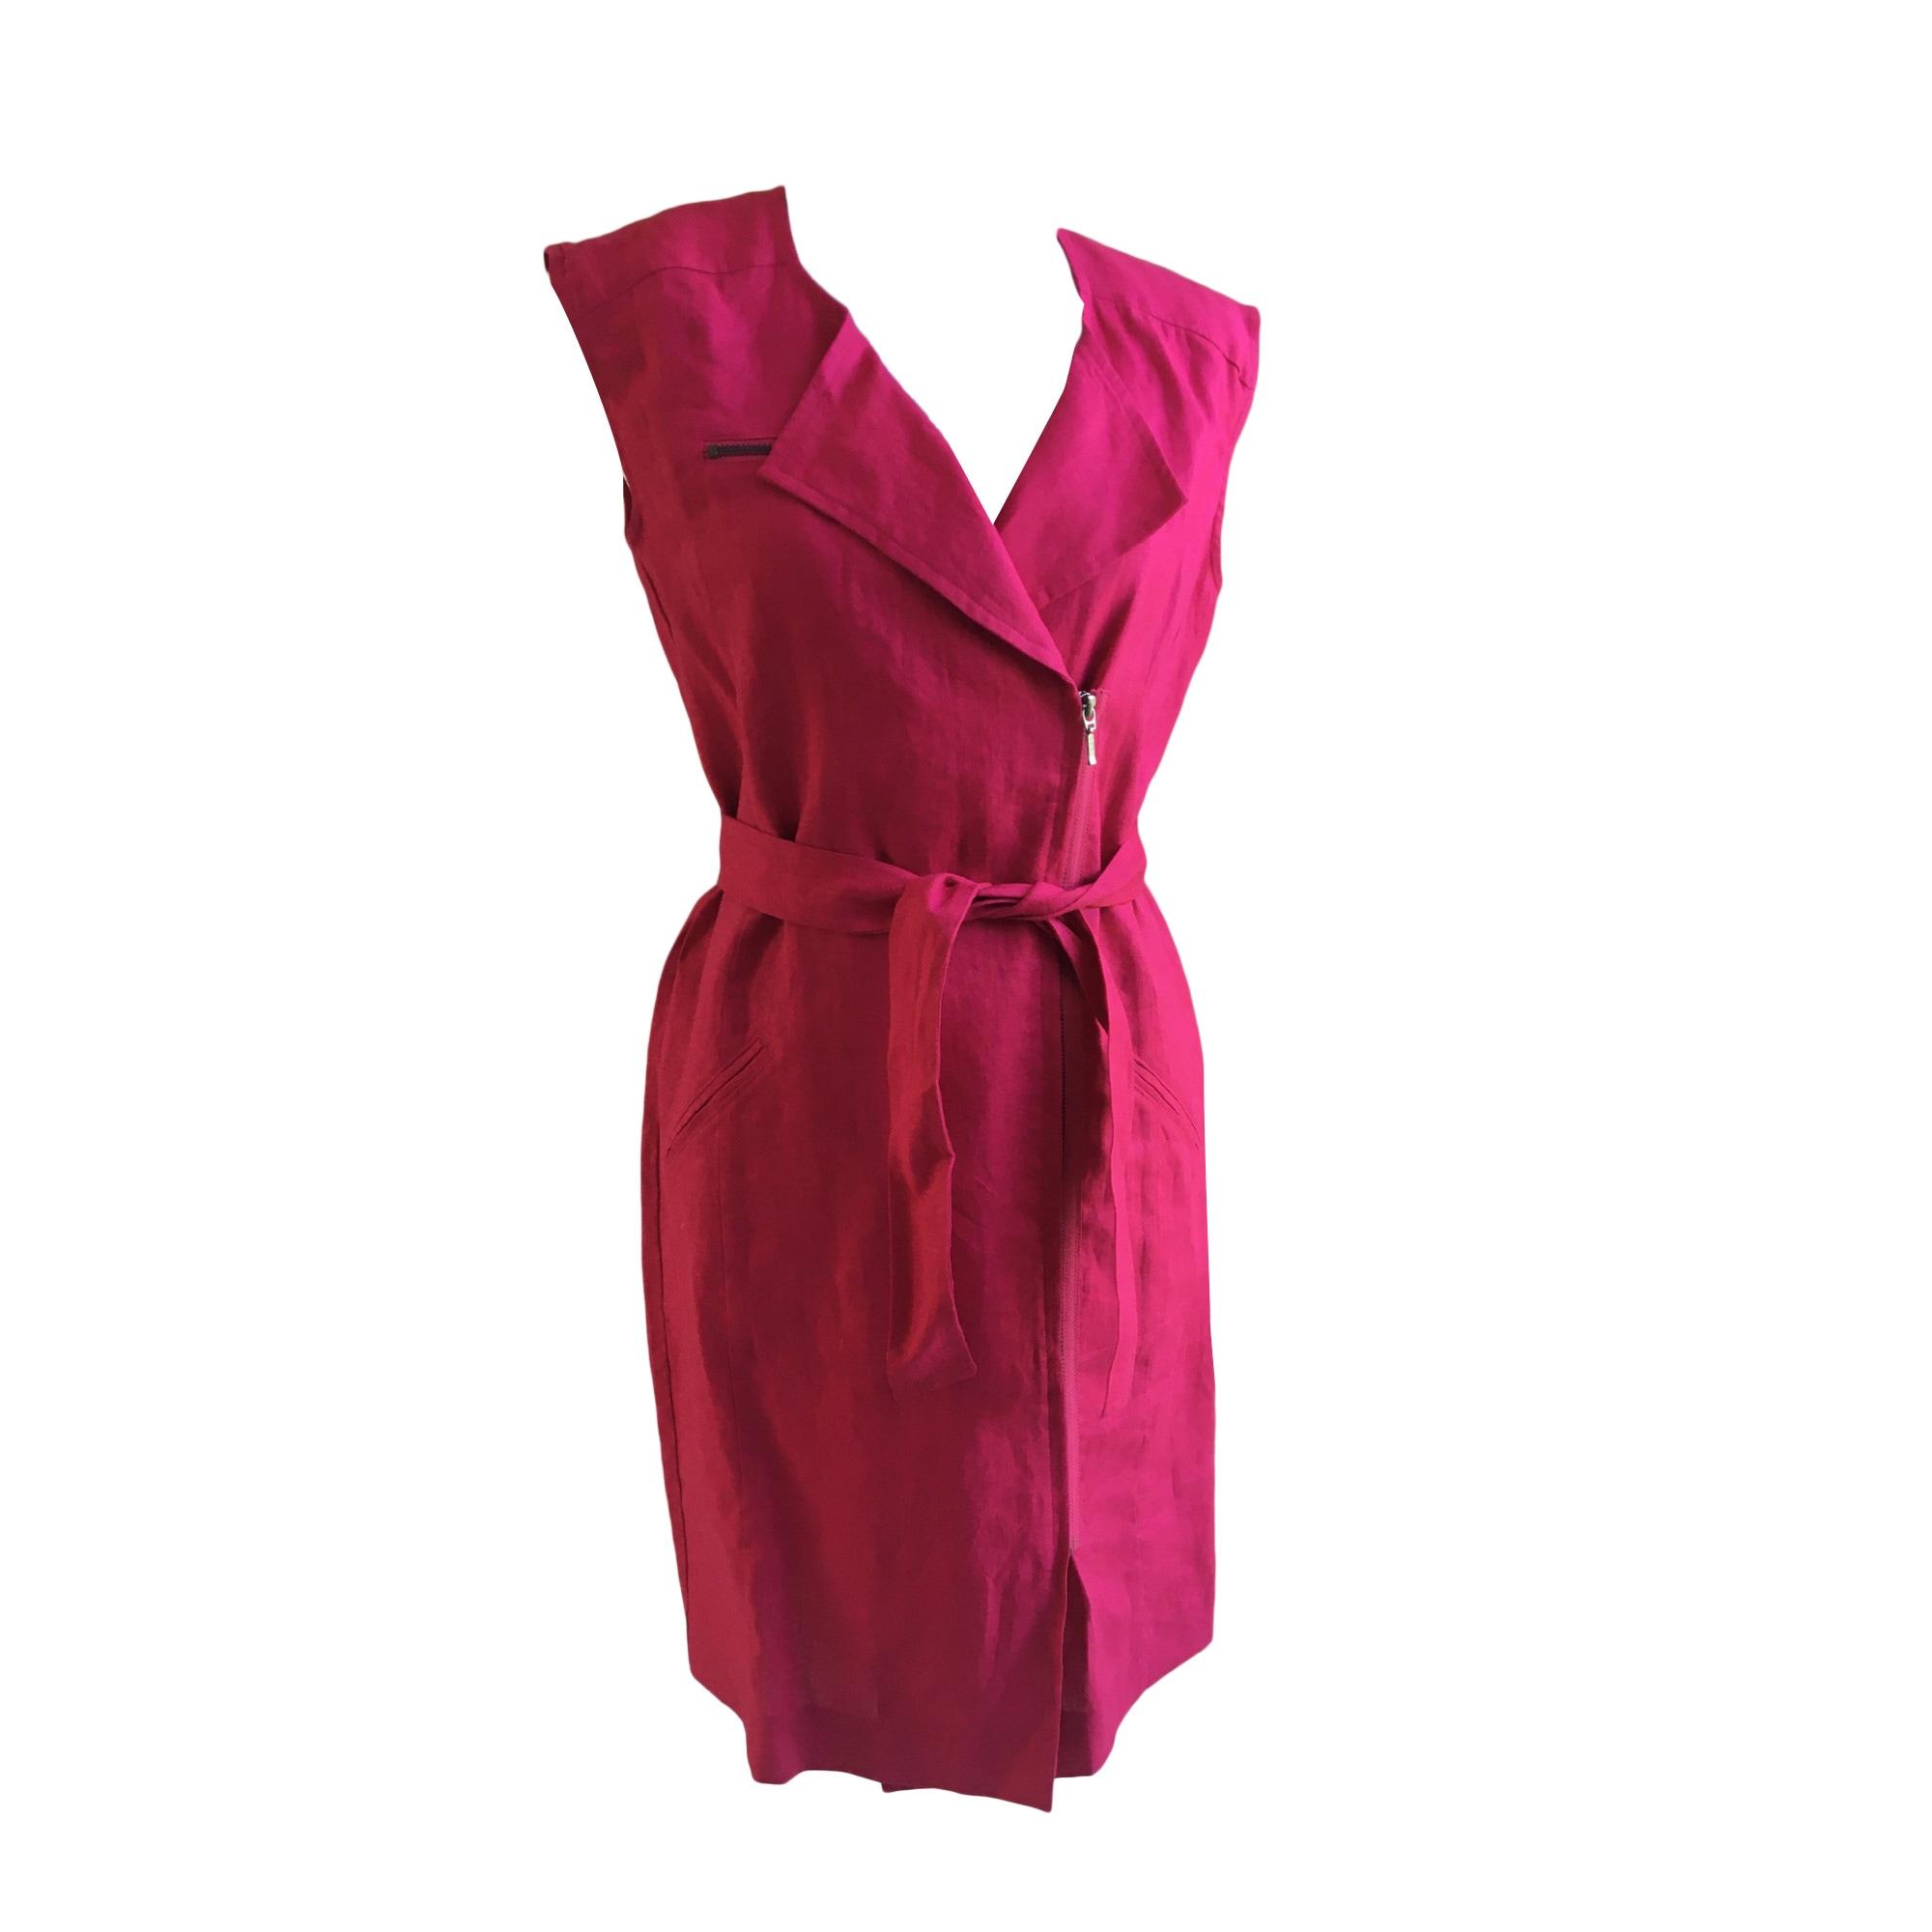 Robe mi-longue GERARD DAREL Rose, fuschia, vieux rose